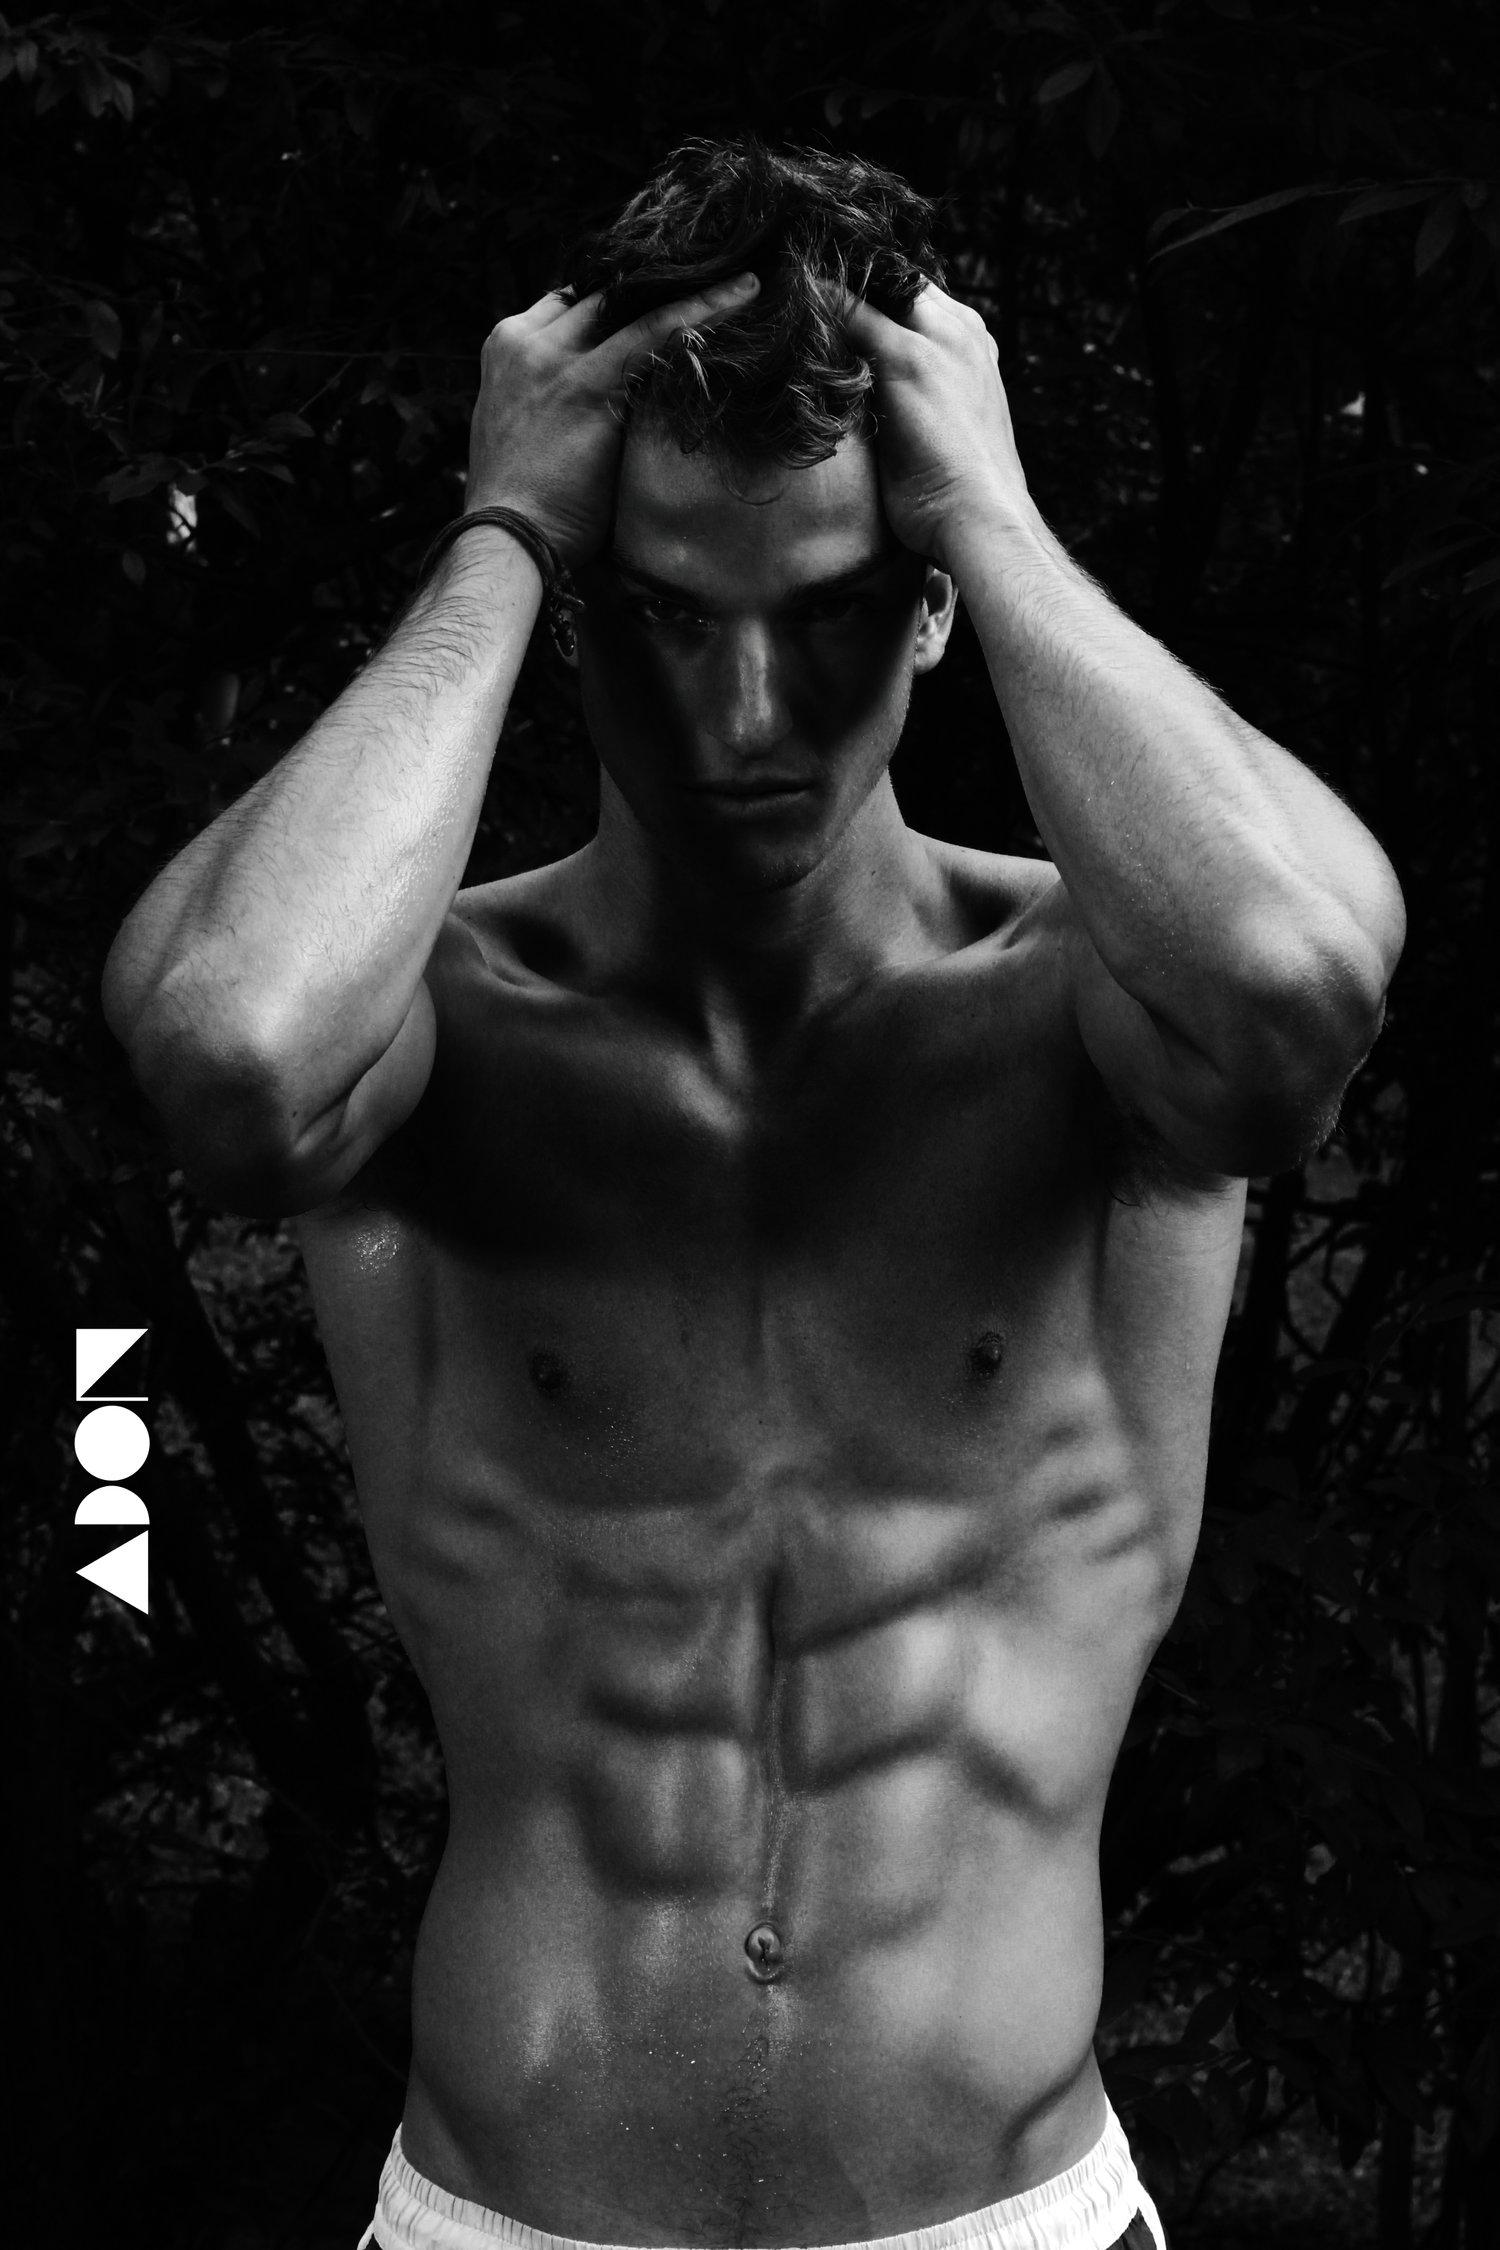 Adon Exclusive: Model Bruno Scafidi By Sef